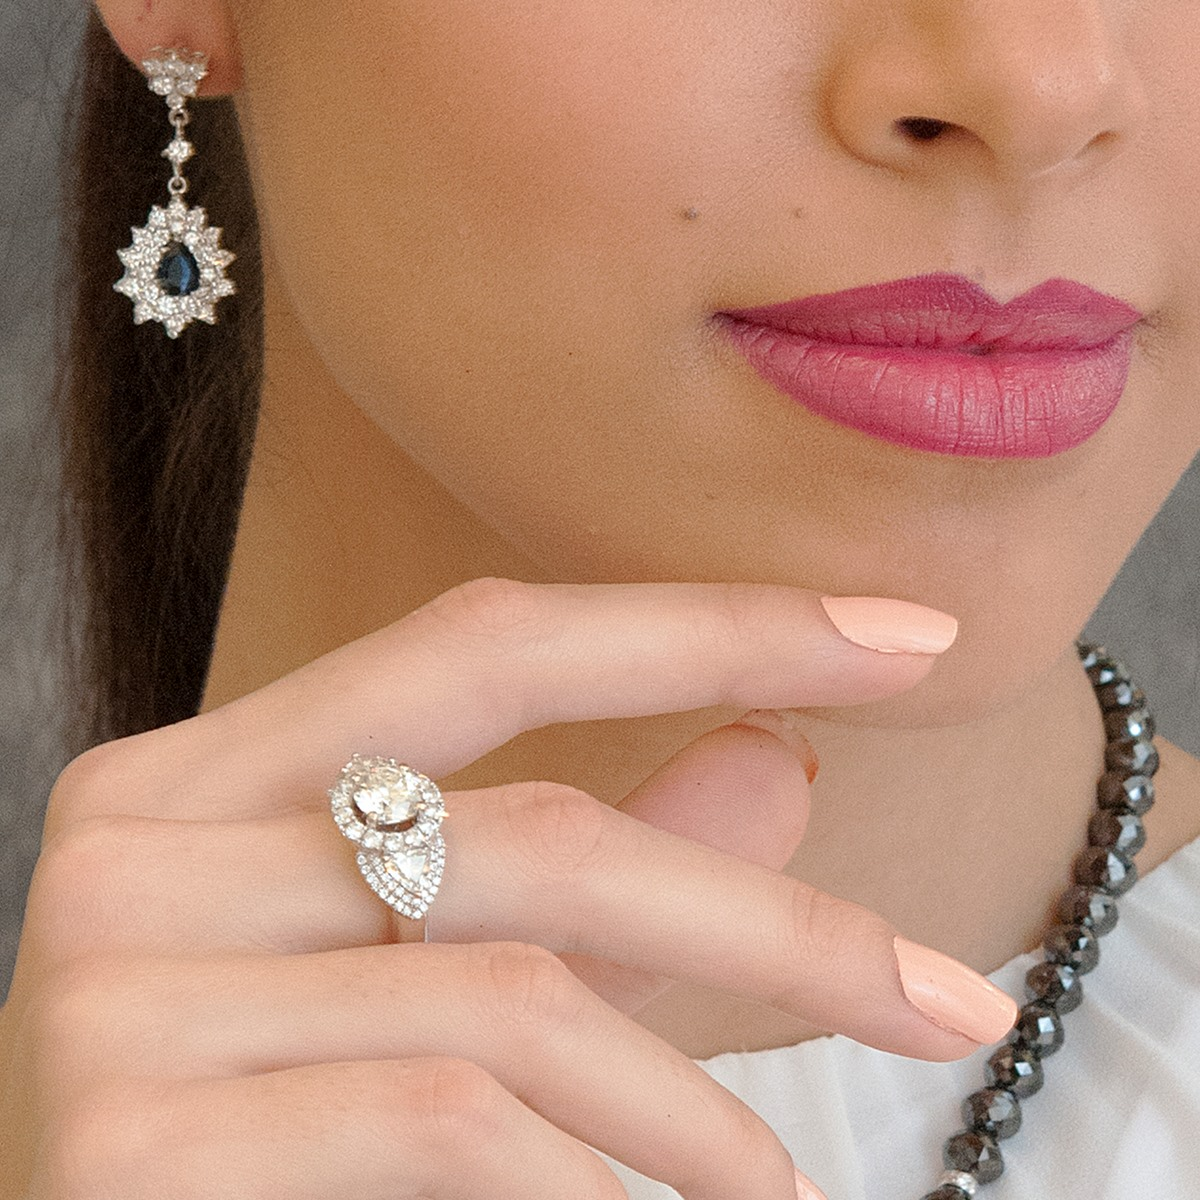 Iordanis jewelry